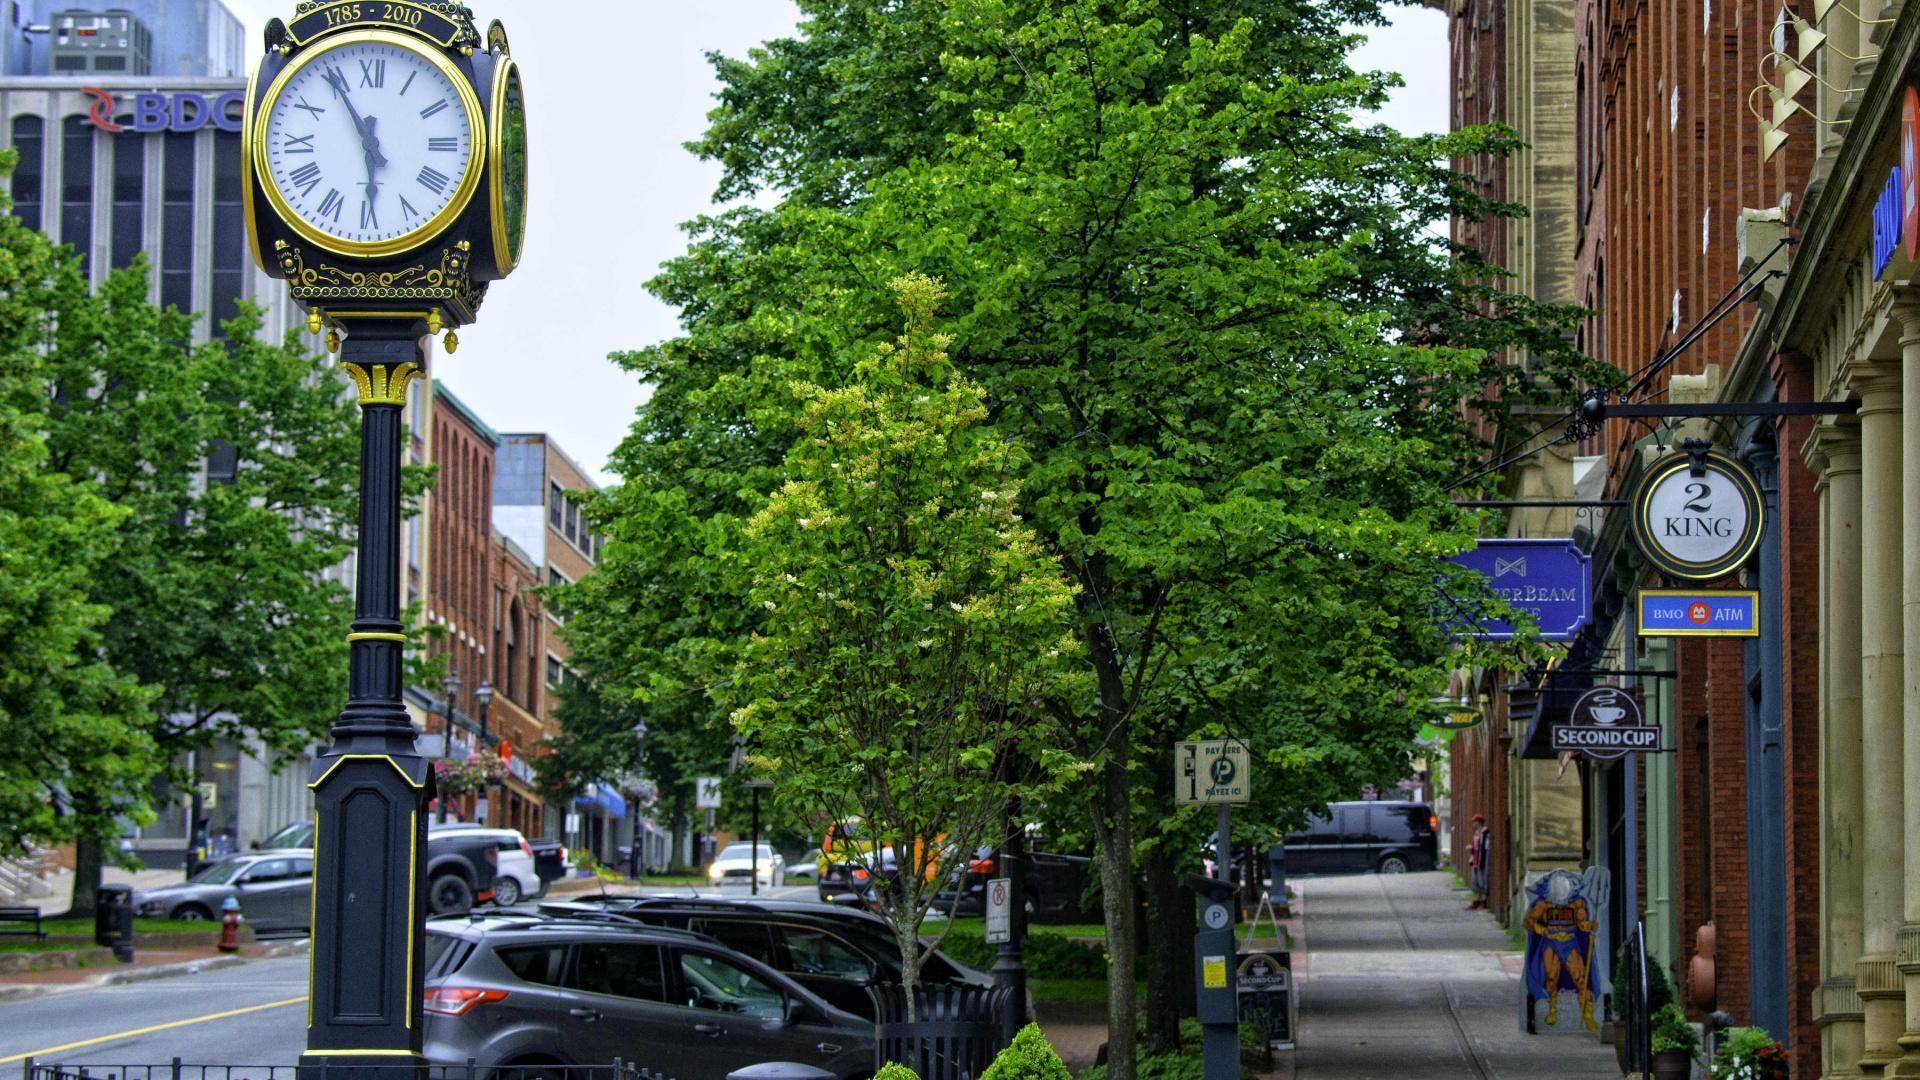 Saint John, New Brunswick city guide